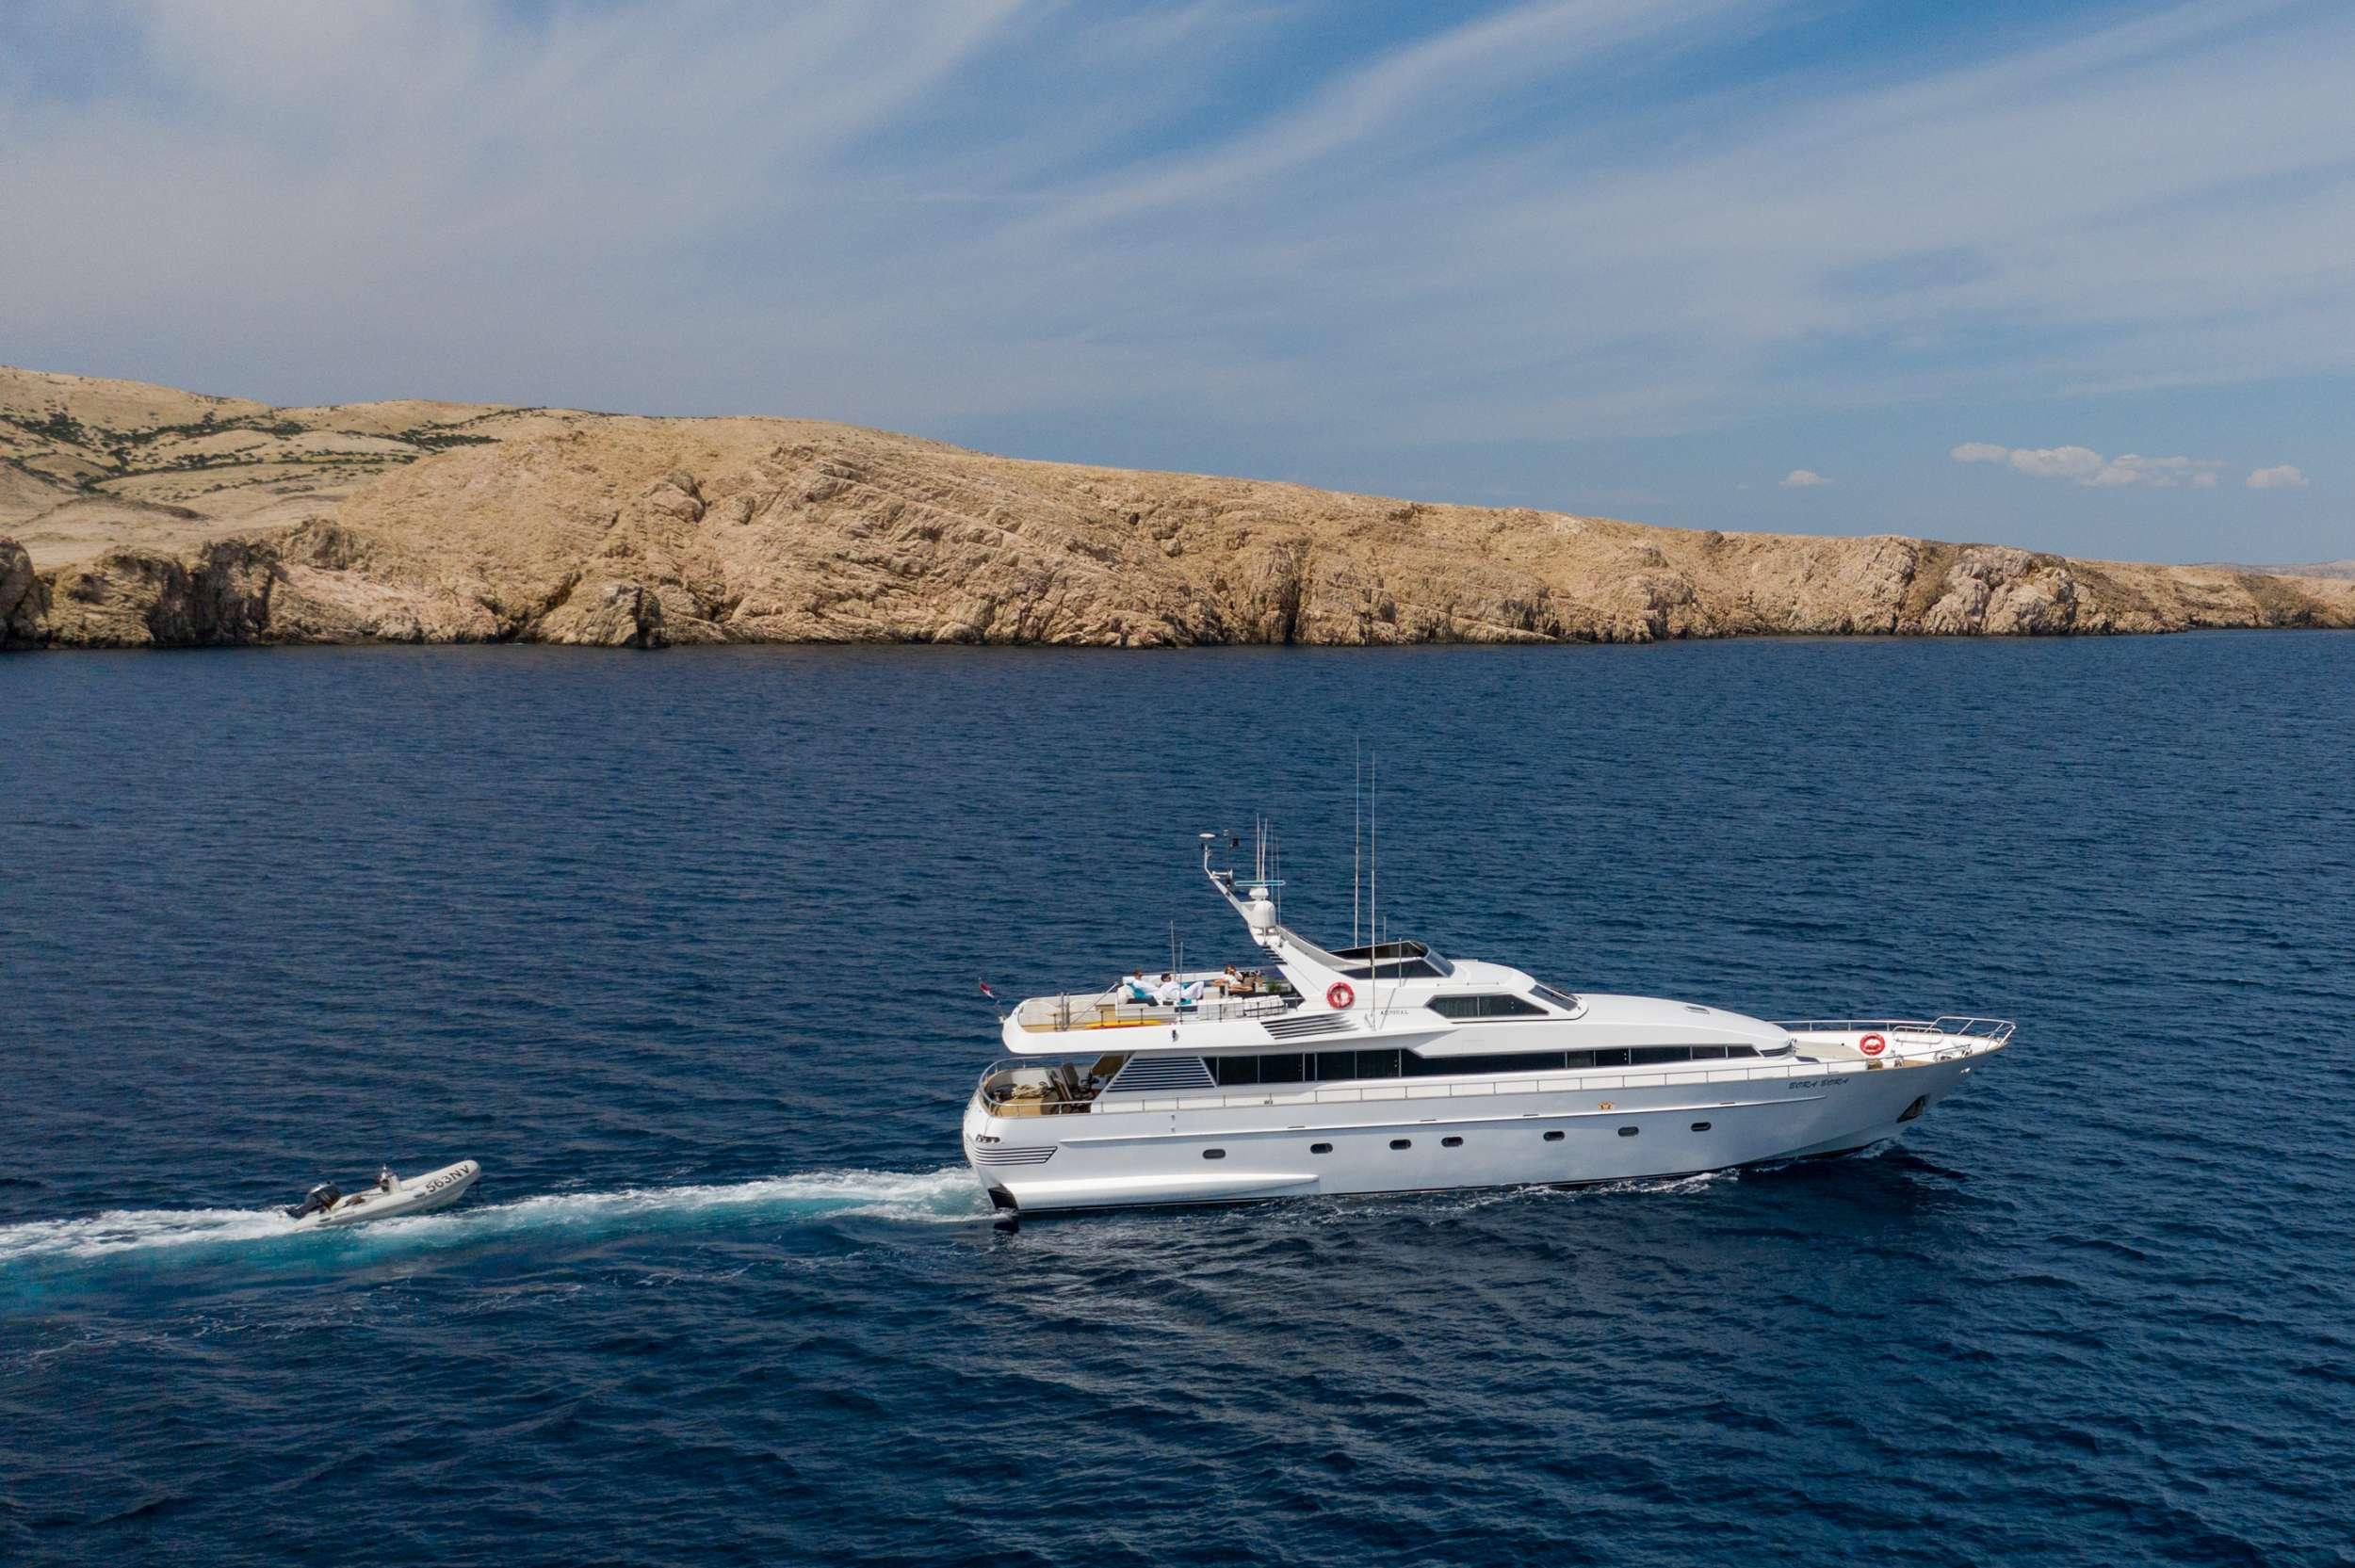 Image of Bora Bora yacht #3